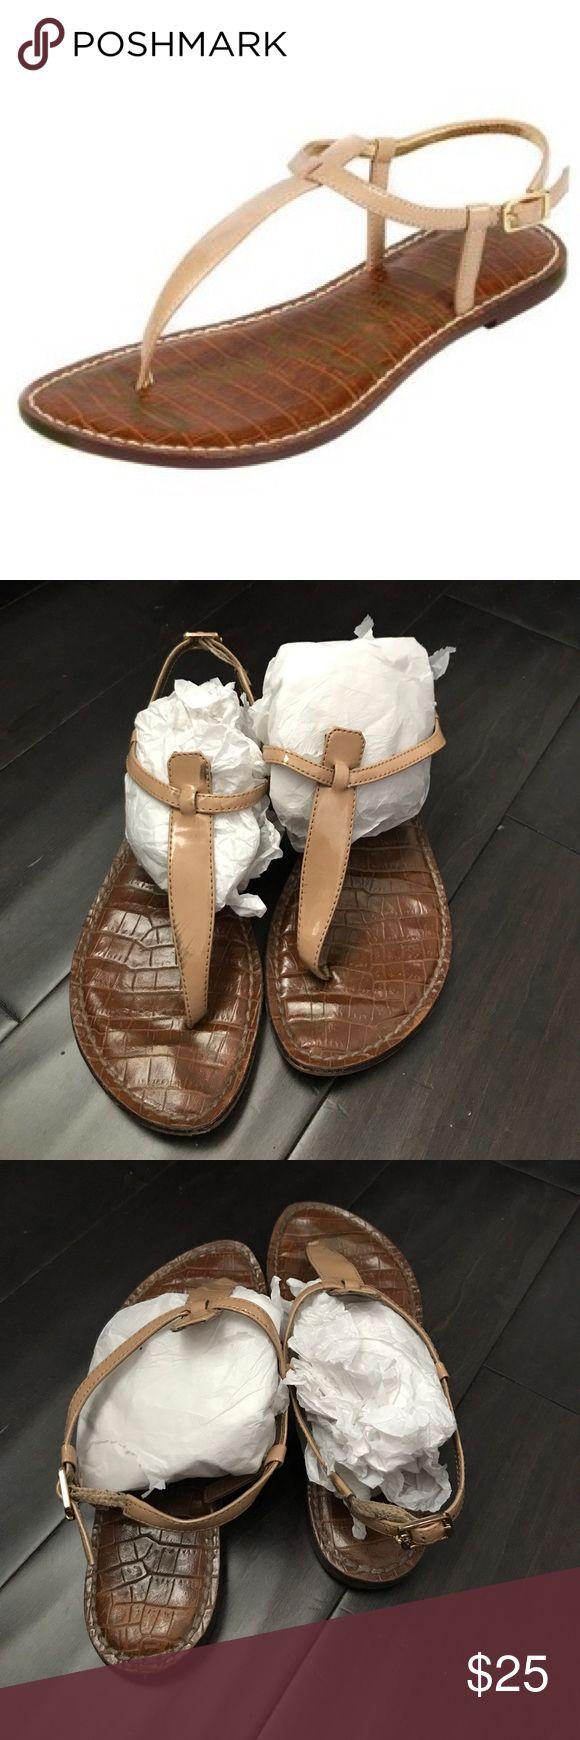 SAM EDELMAN GIGI SANDALS SAM EDELMAN GIGI SANDALS Size 6 Sam Edelman Shoes Sandals